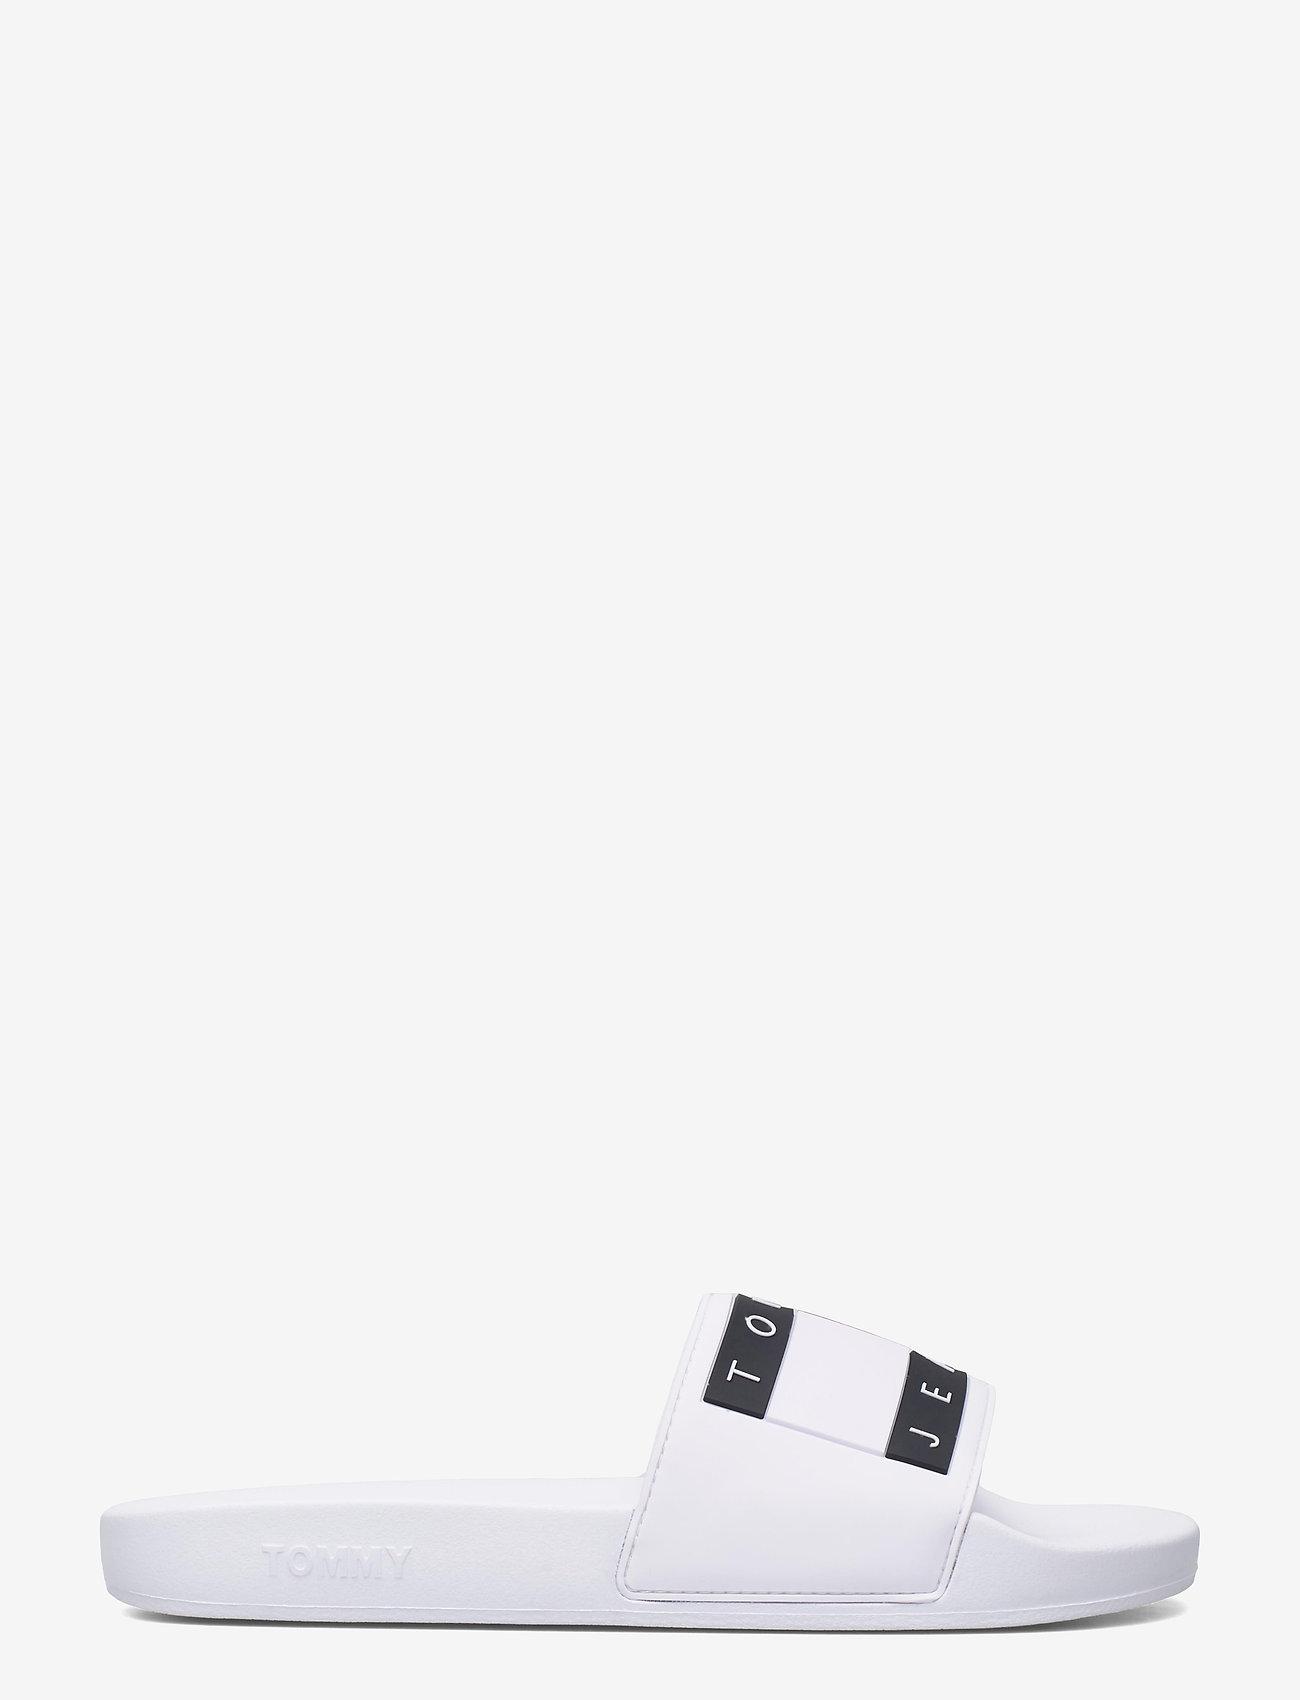 Tommy Hilfiger - TOMMY JEANS FLAG POOL SLIDE - pool sliders - white - 1